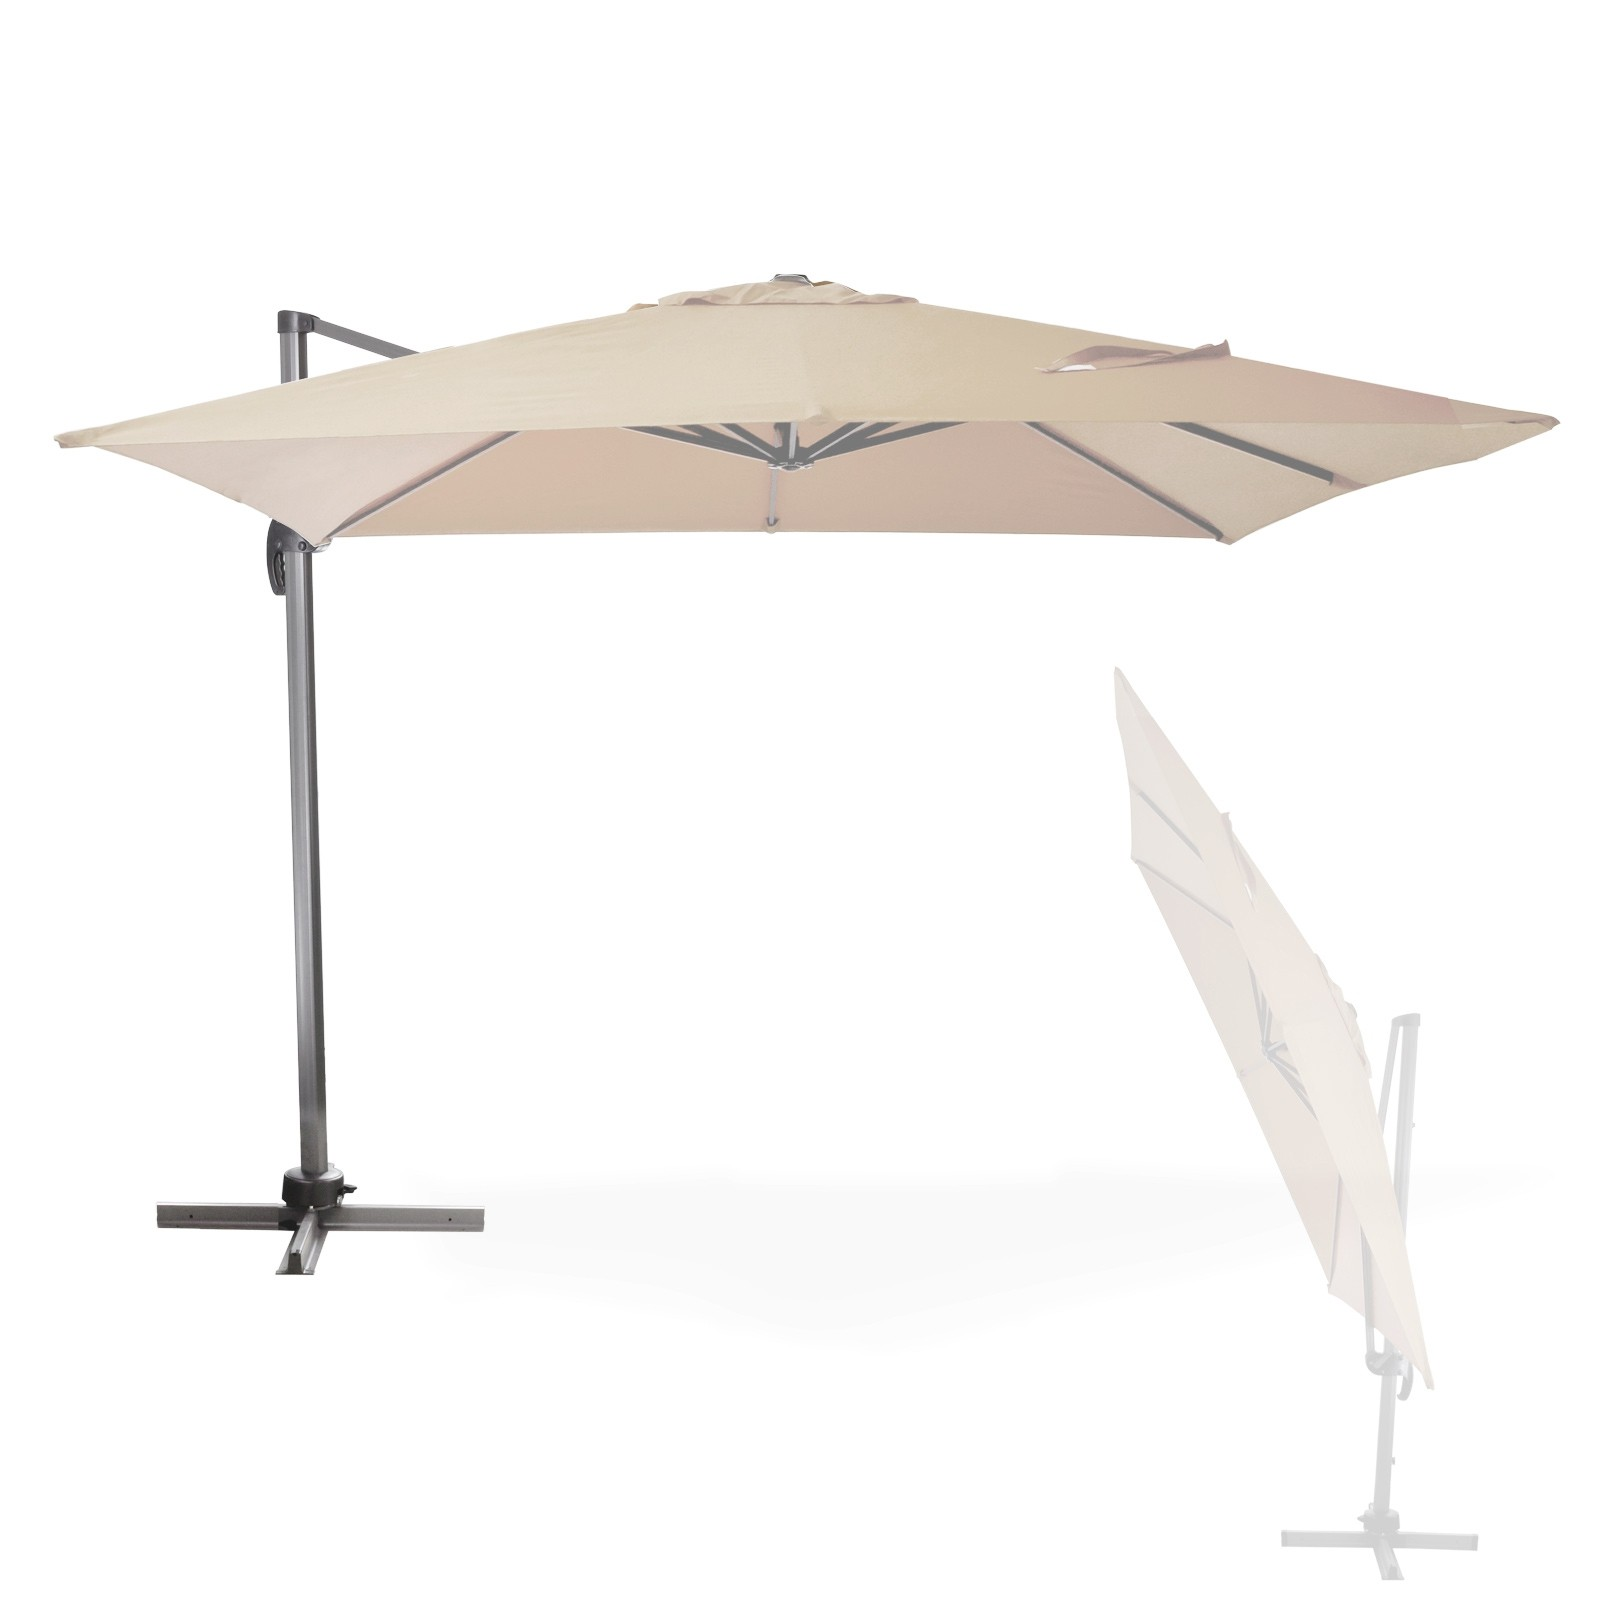 Dema Sonnenschirm Ampelschirm 3x3m Gartenschirm Marktschirm Verona Ecru Beige 41284